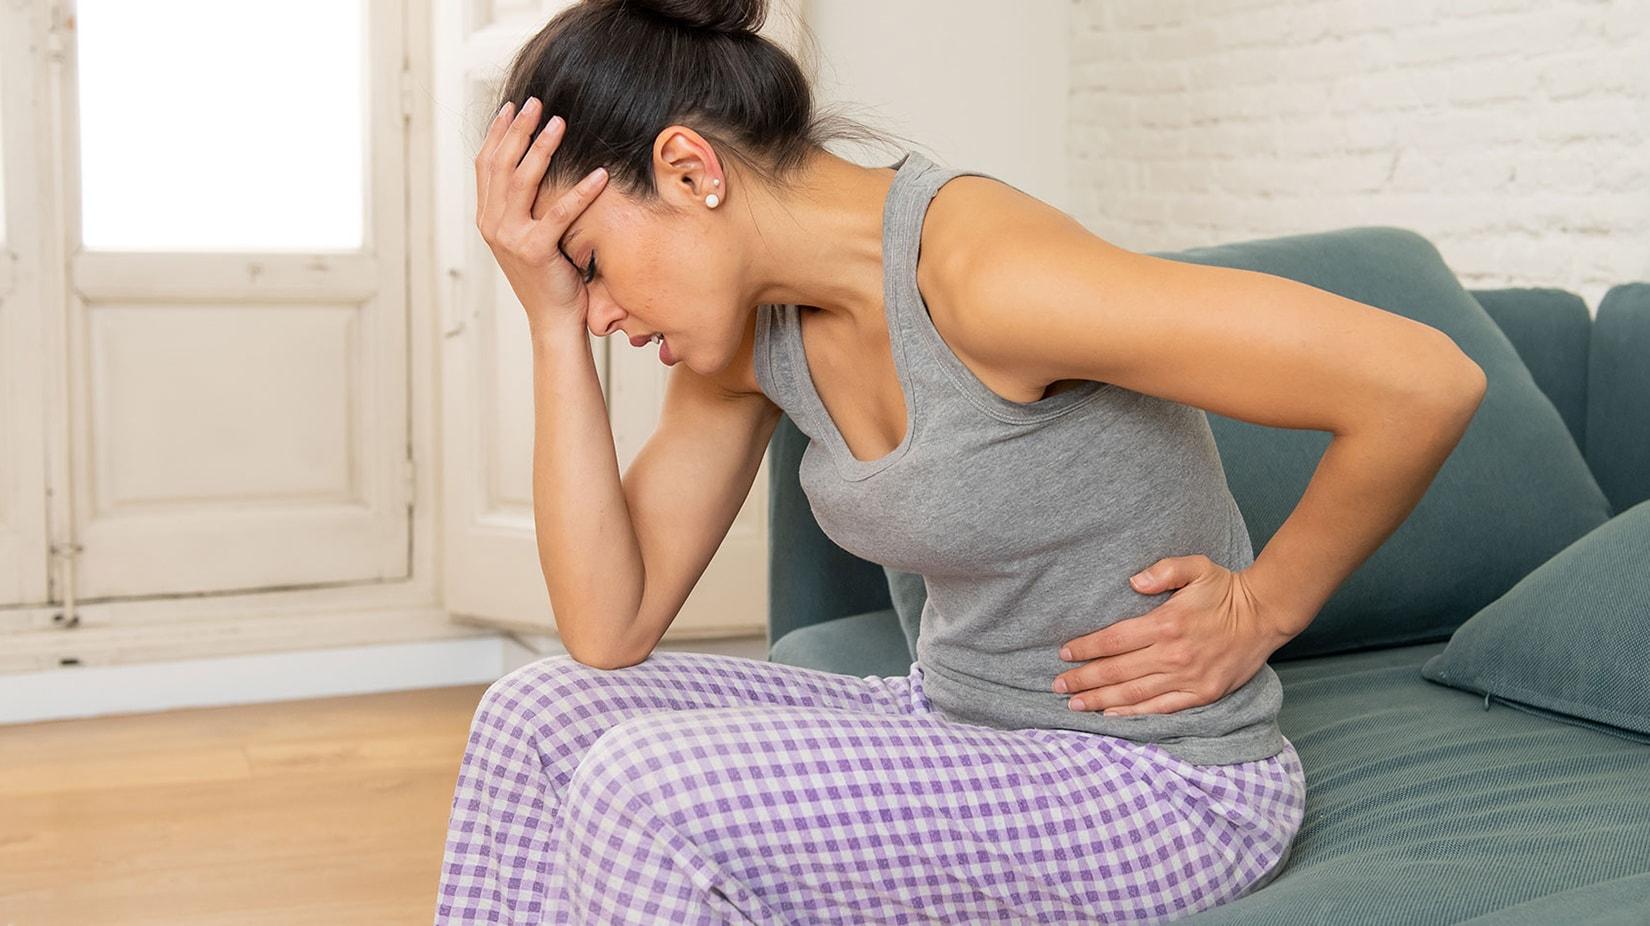 sindrome premestruale milano